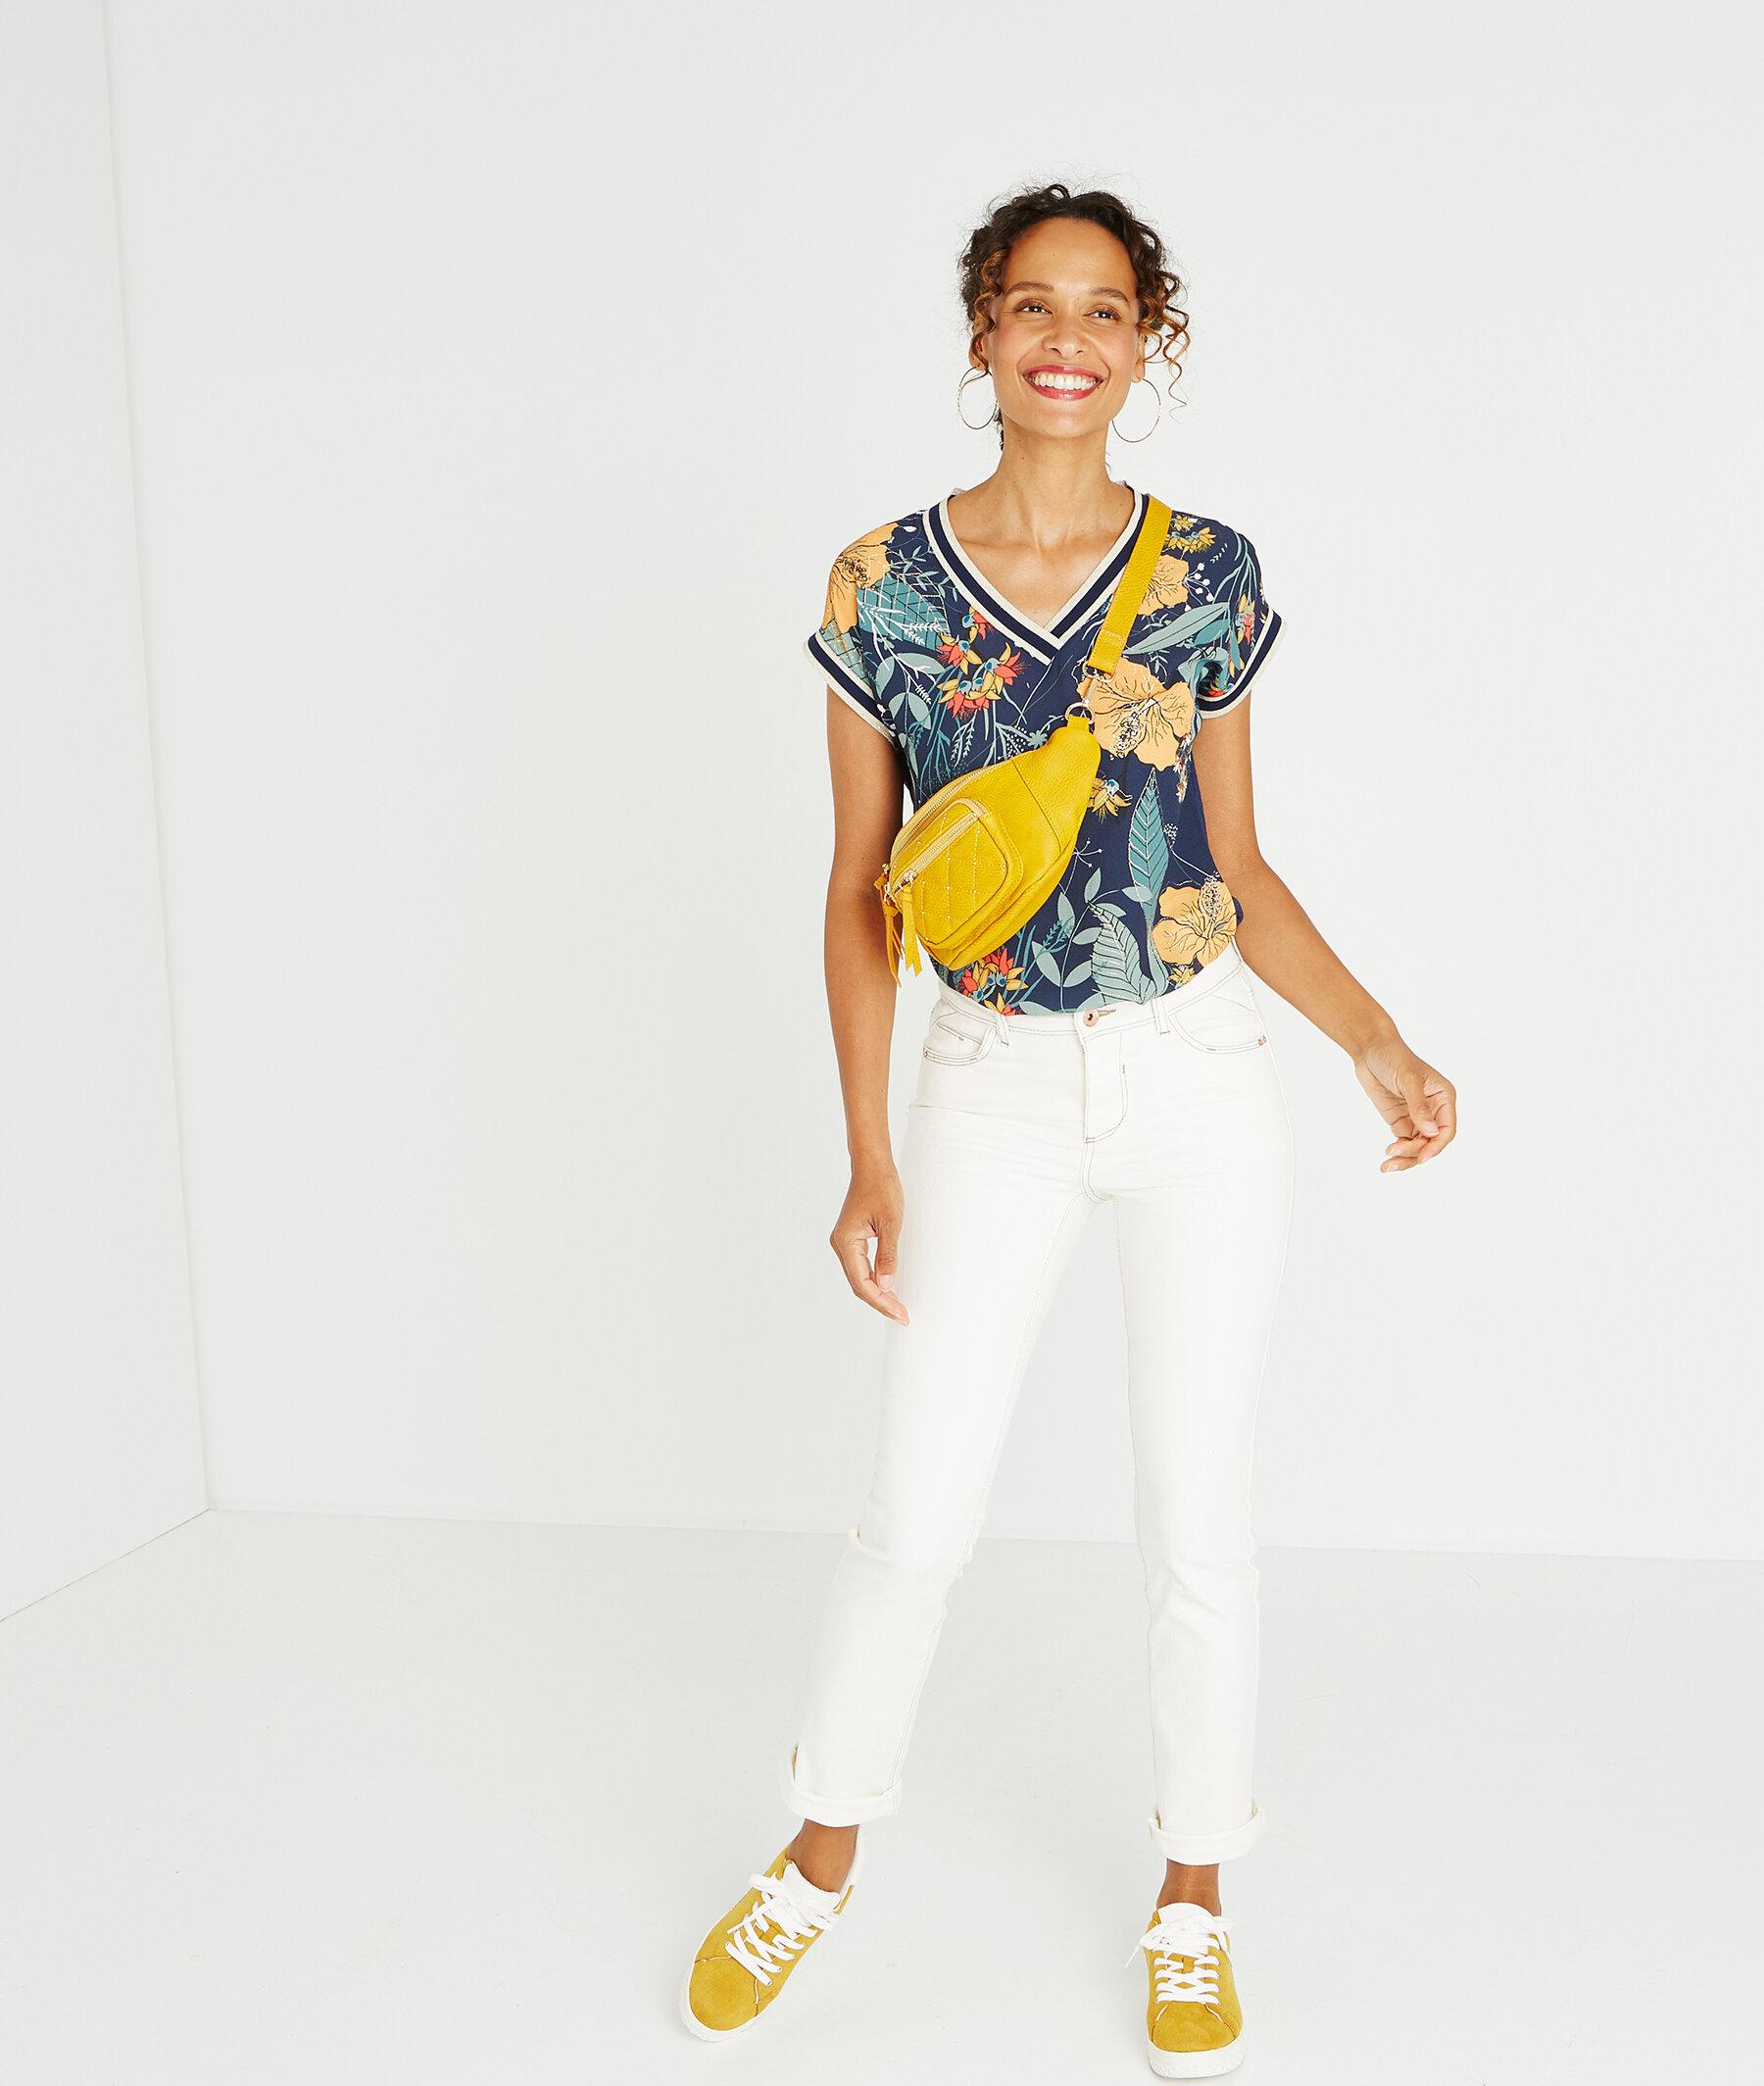 b21004dc9f Jean blanc raccourci coutures apparentes BLANC - Grain de Malice